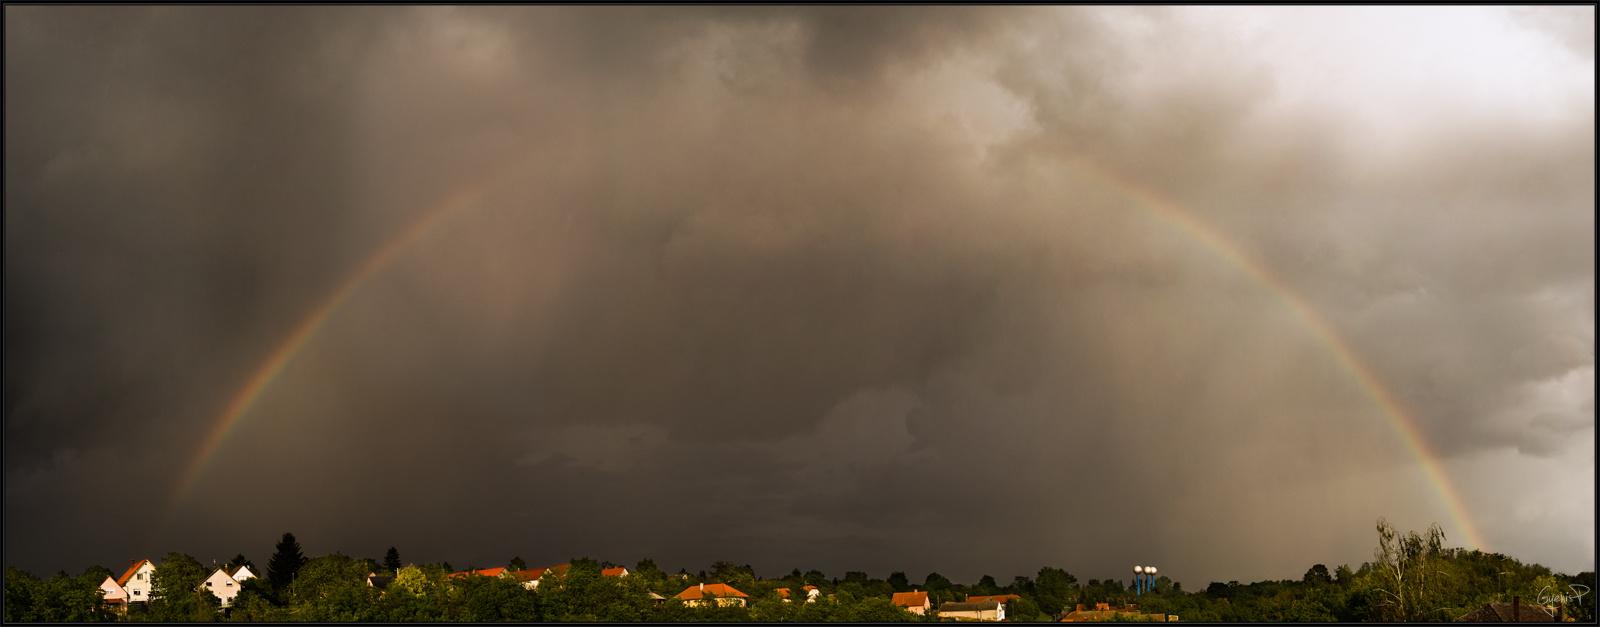 Gyenis: Somewhere over the rainbow...